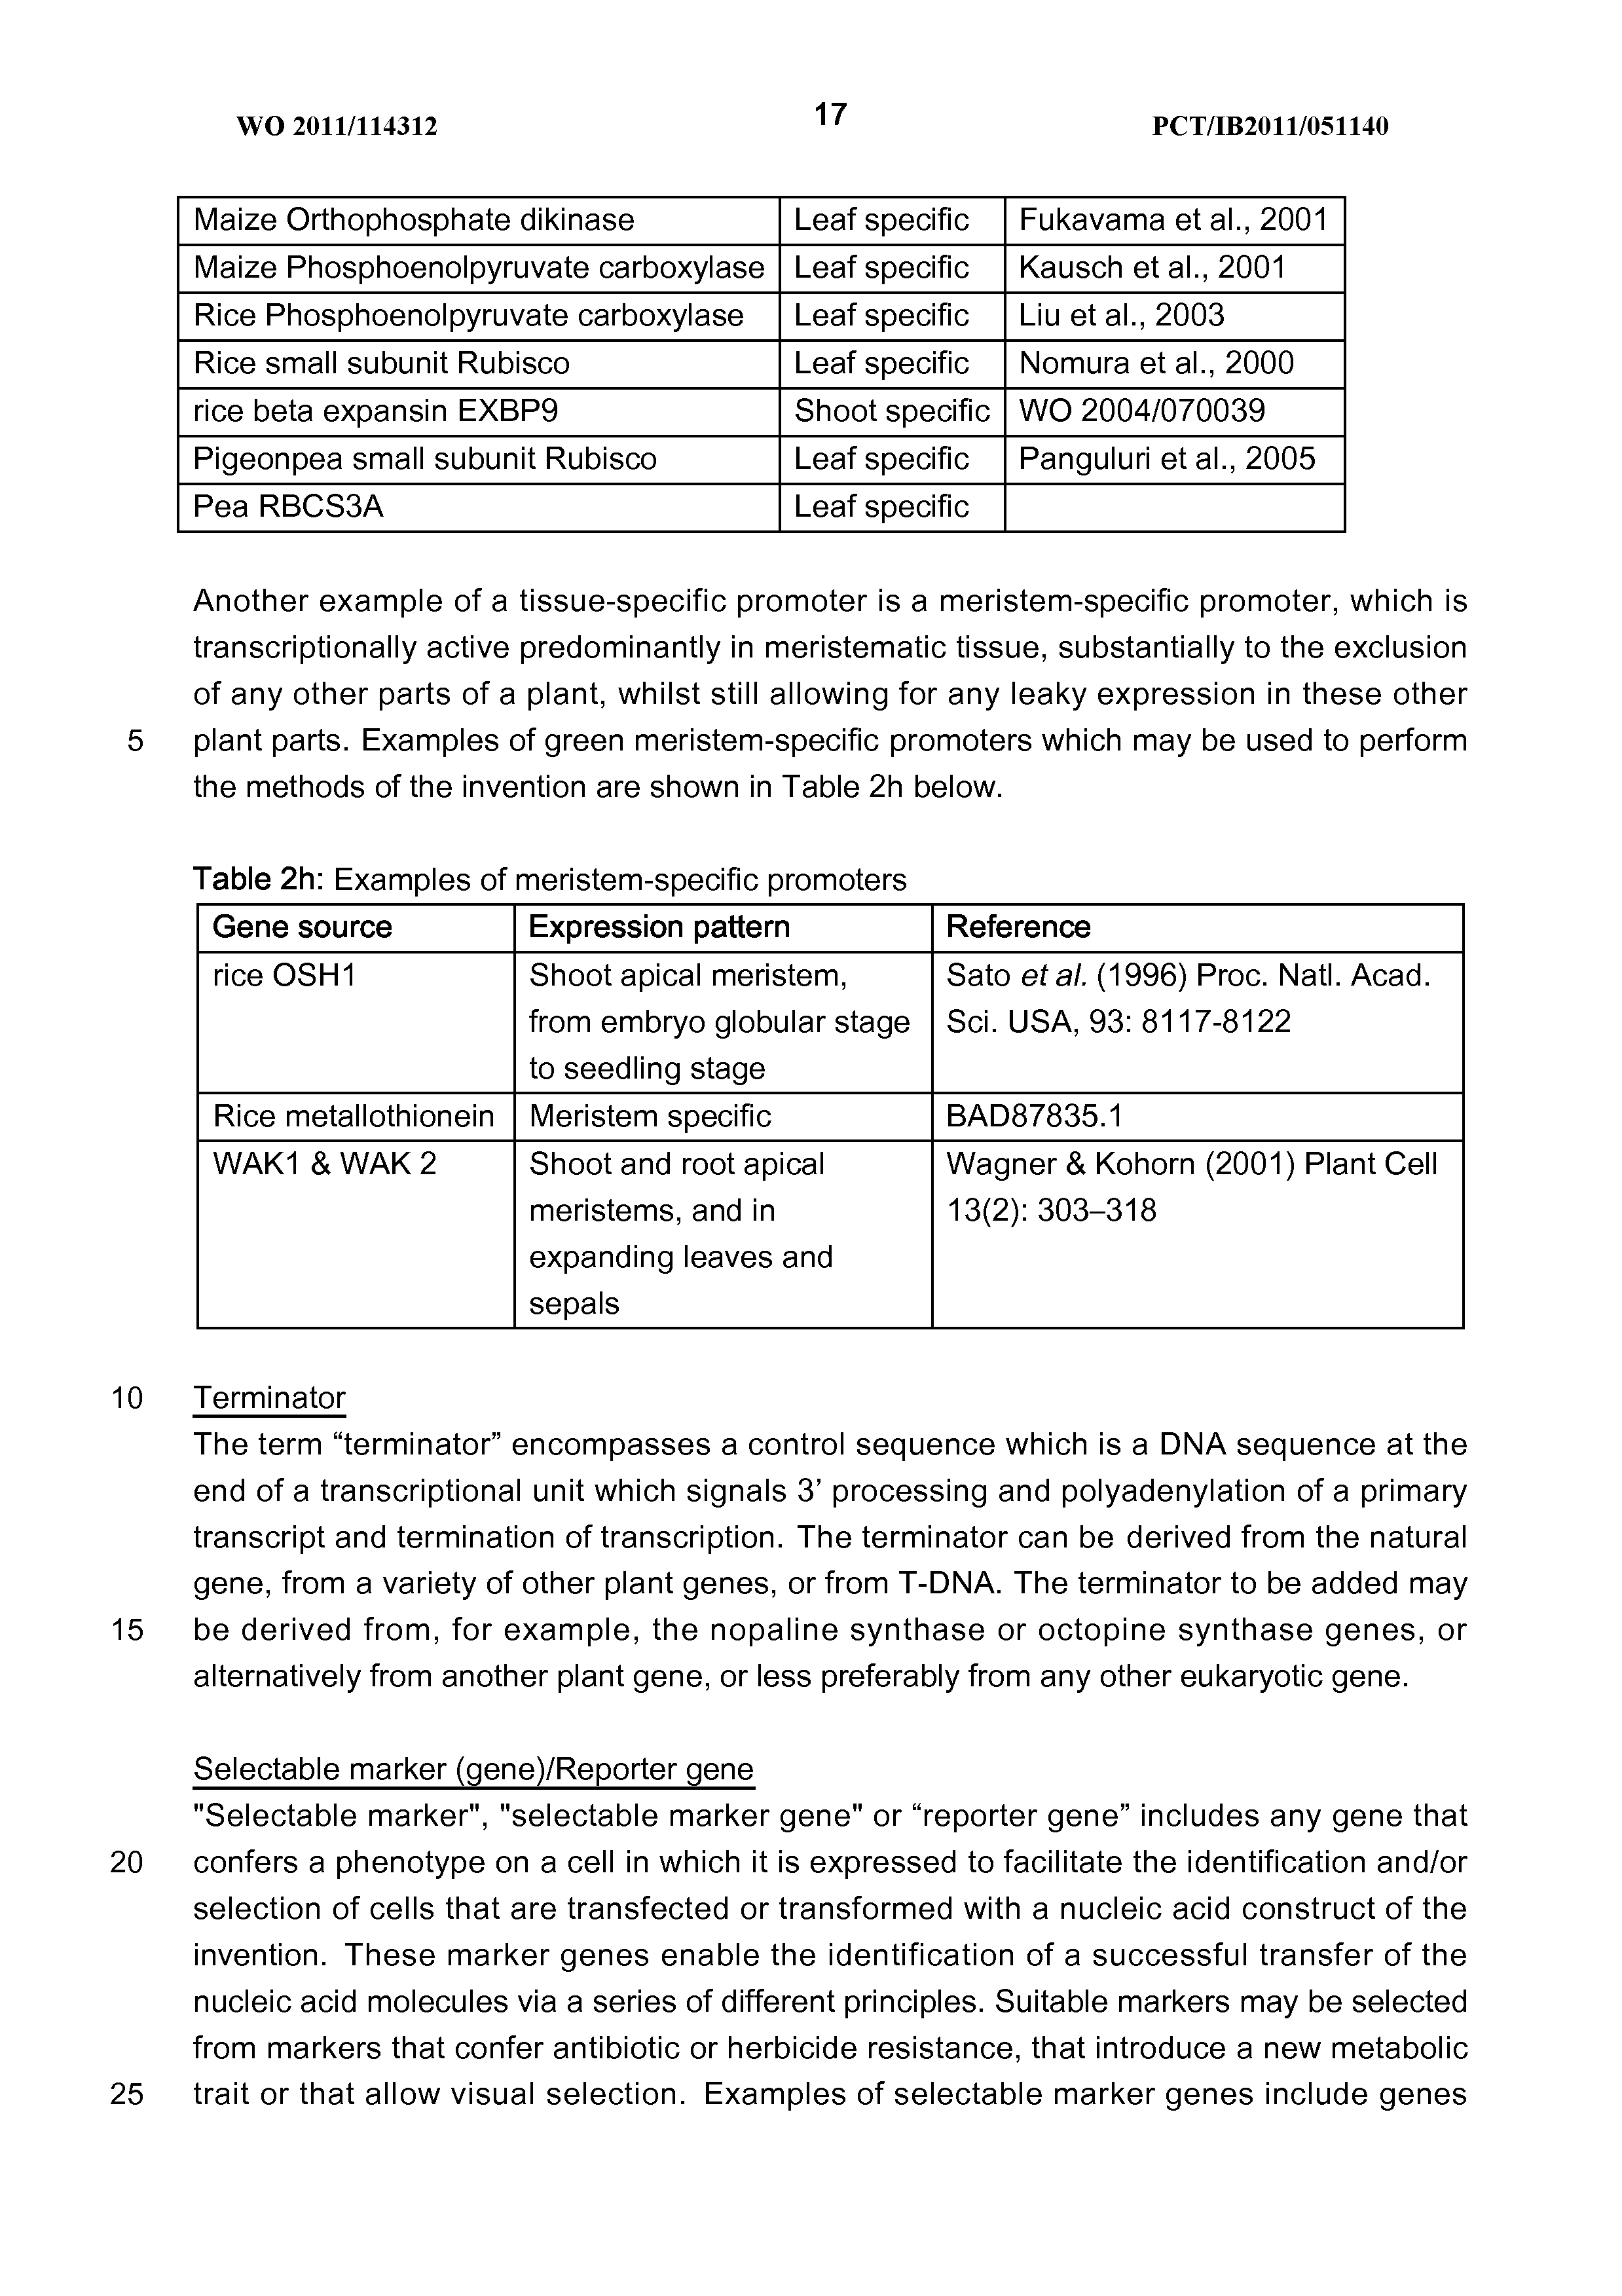 WO 2011/114312 A1 - Plants Having Enhanced Yield-related